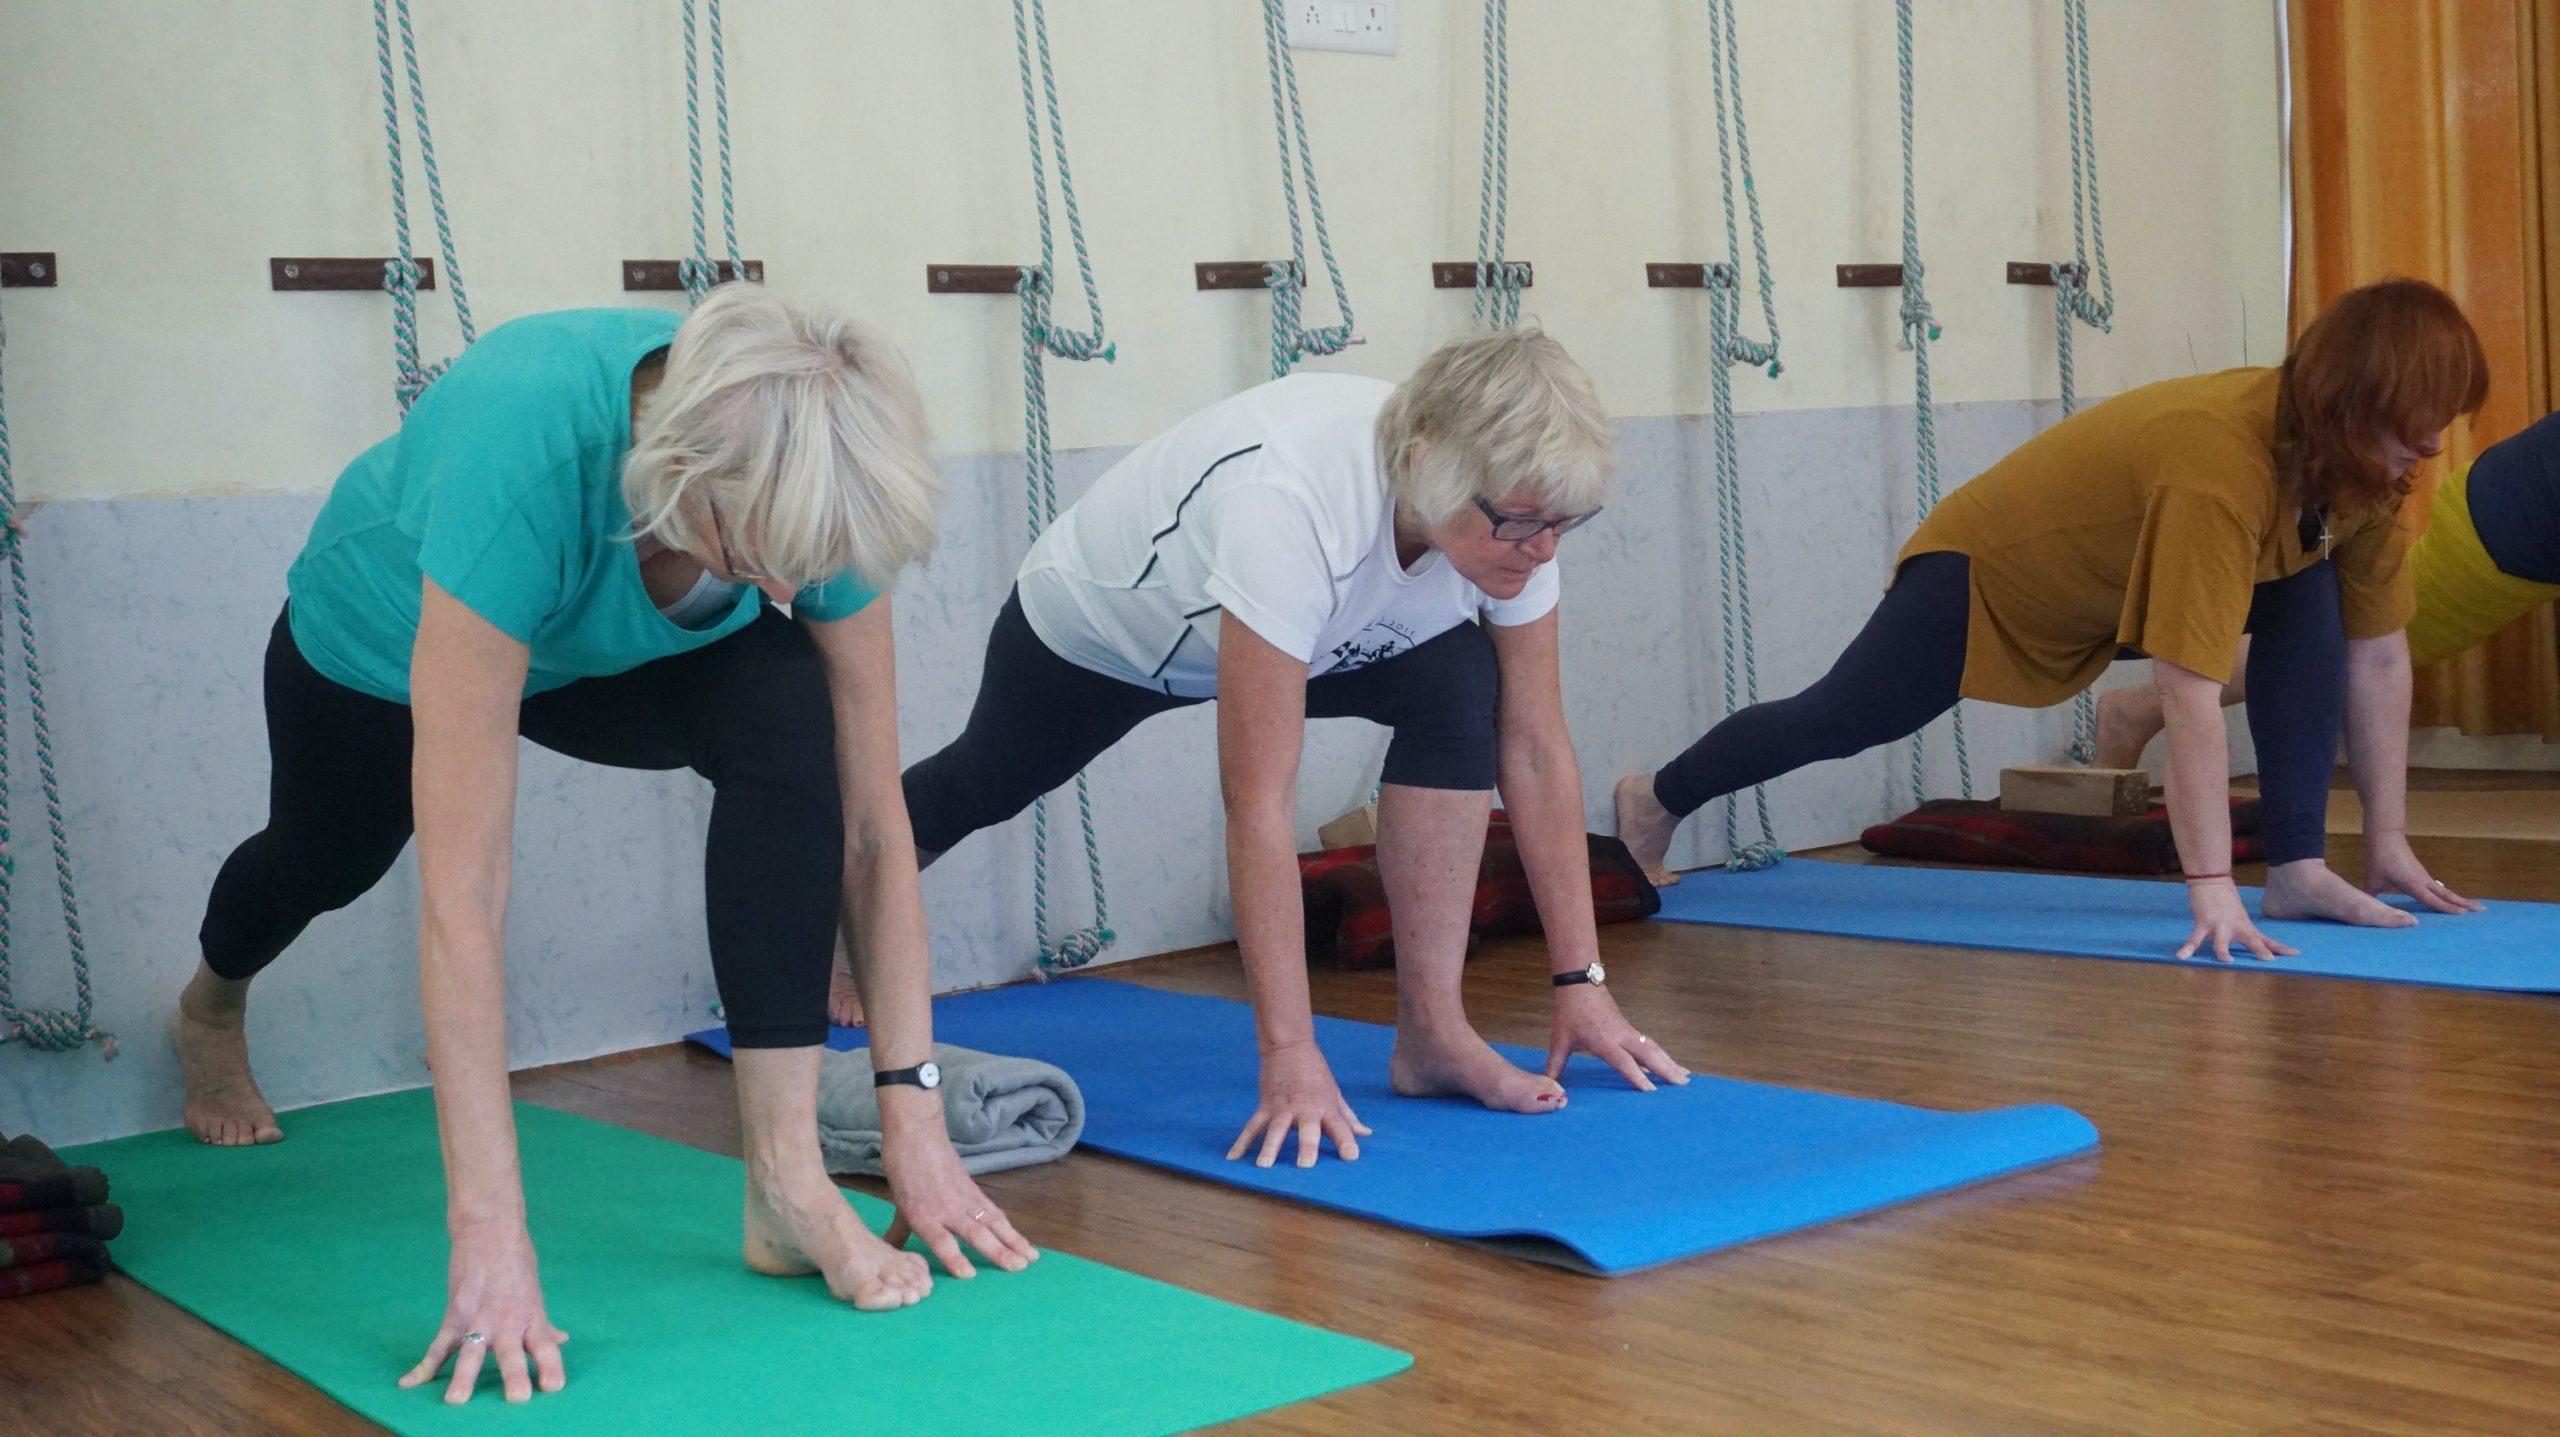 Two older women doing a yoga class.